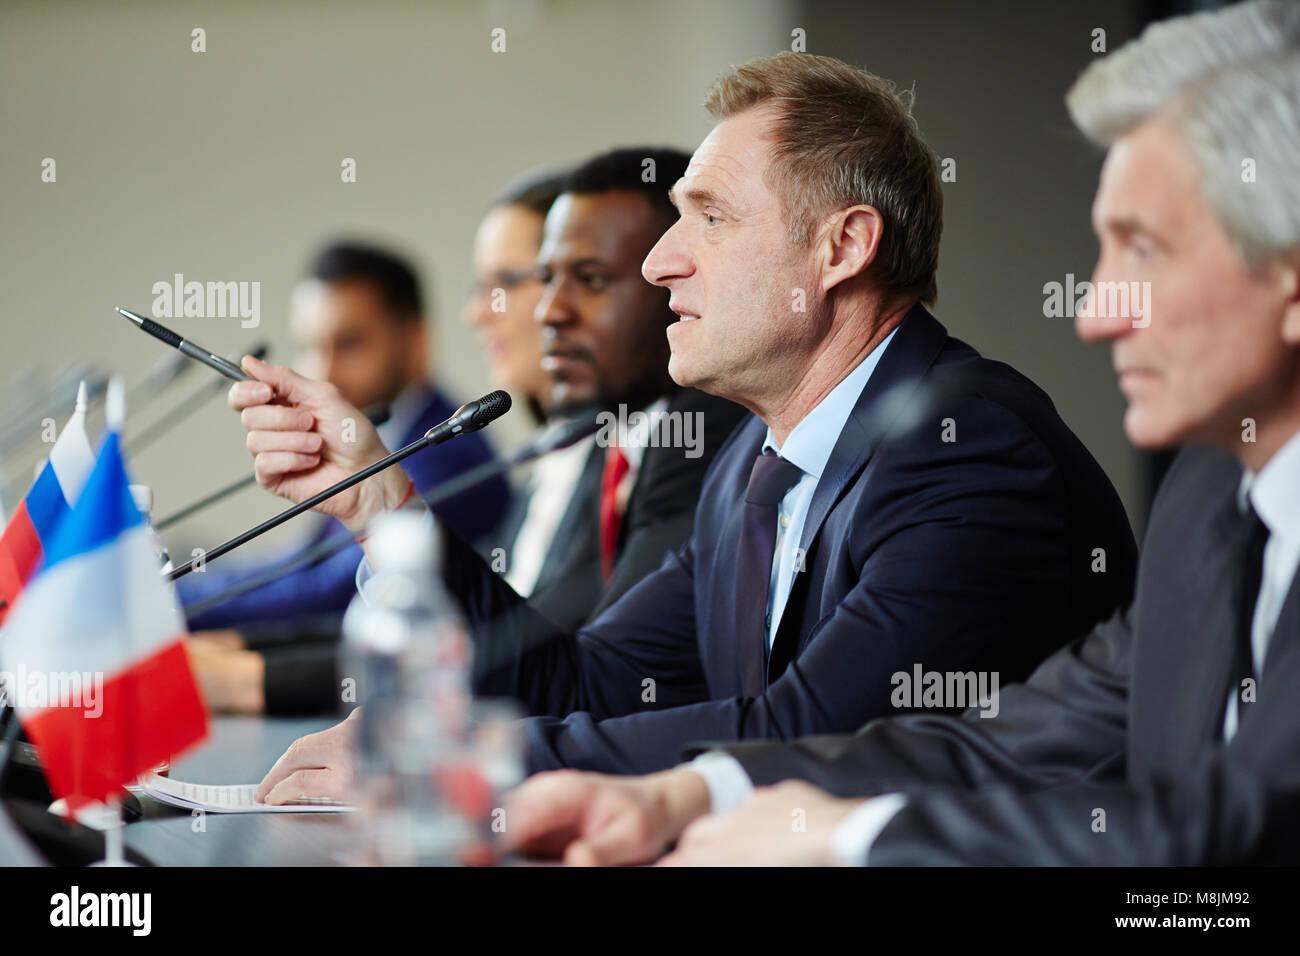 Politician speaking - Stock Image